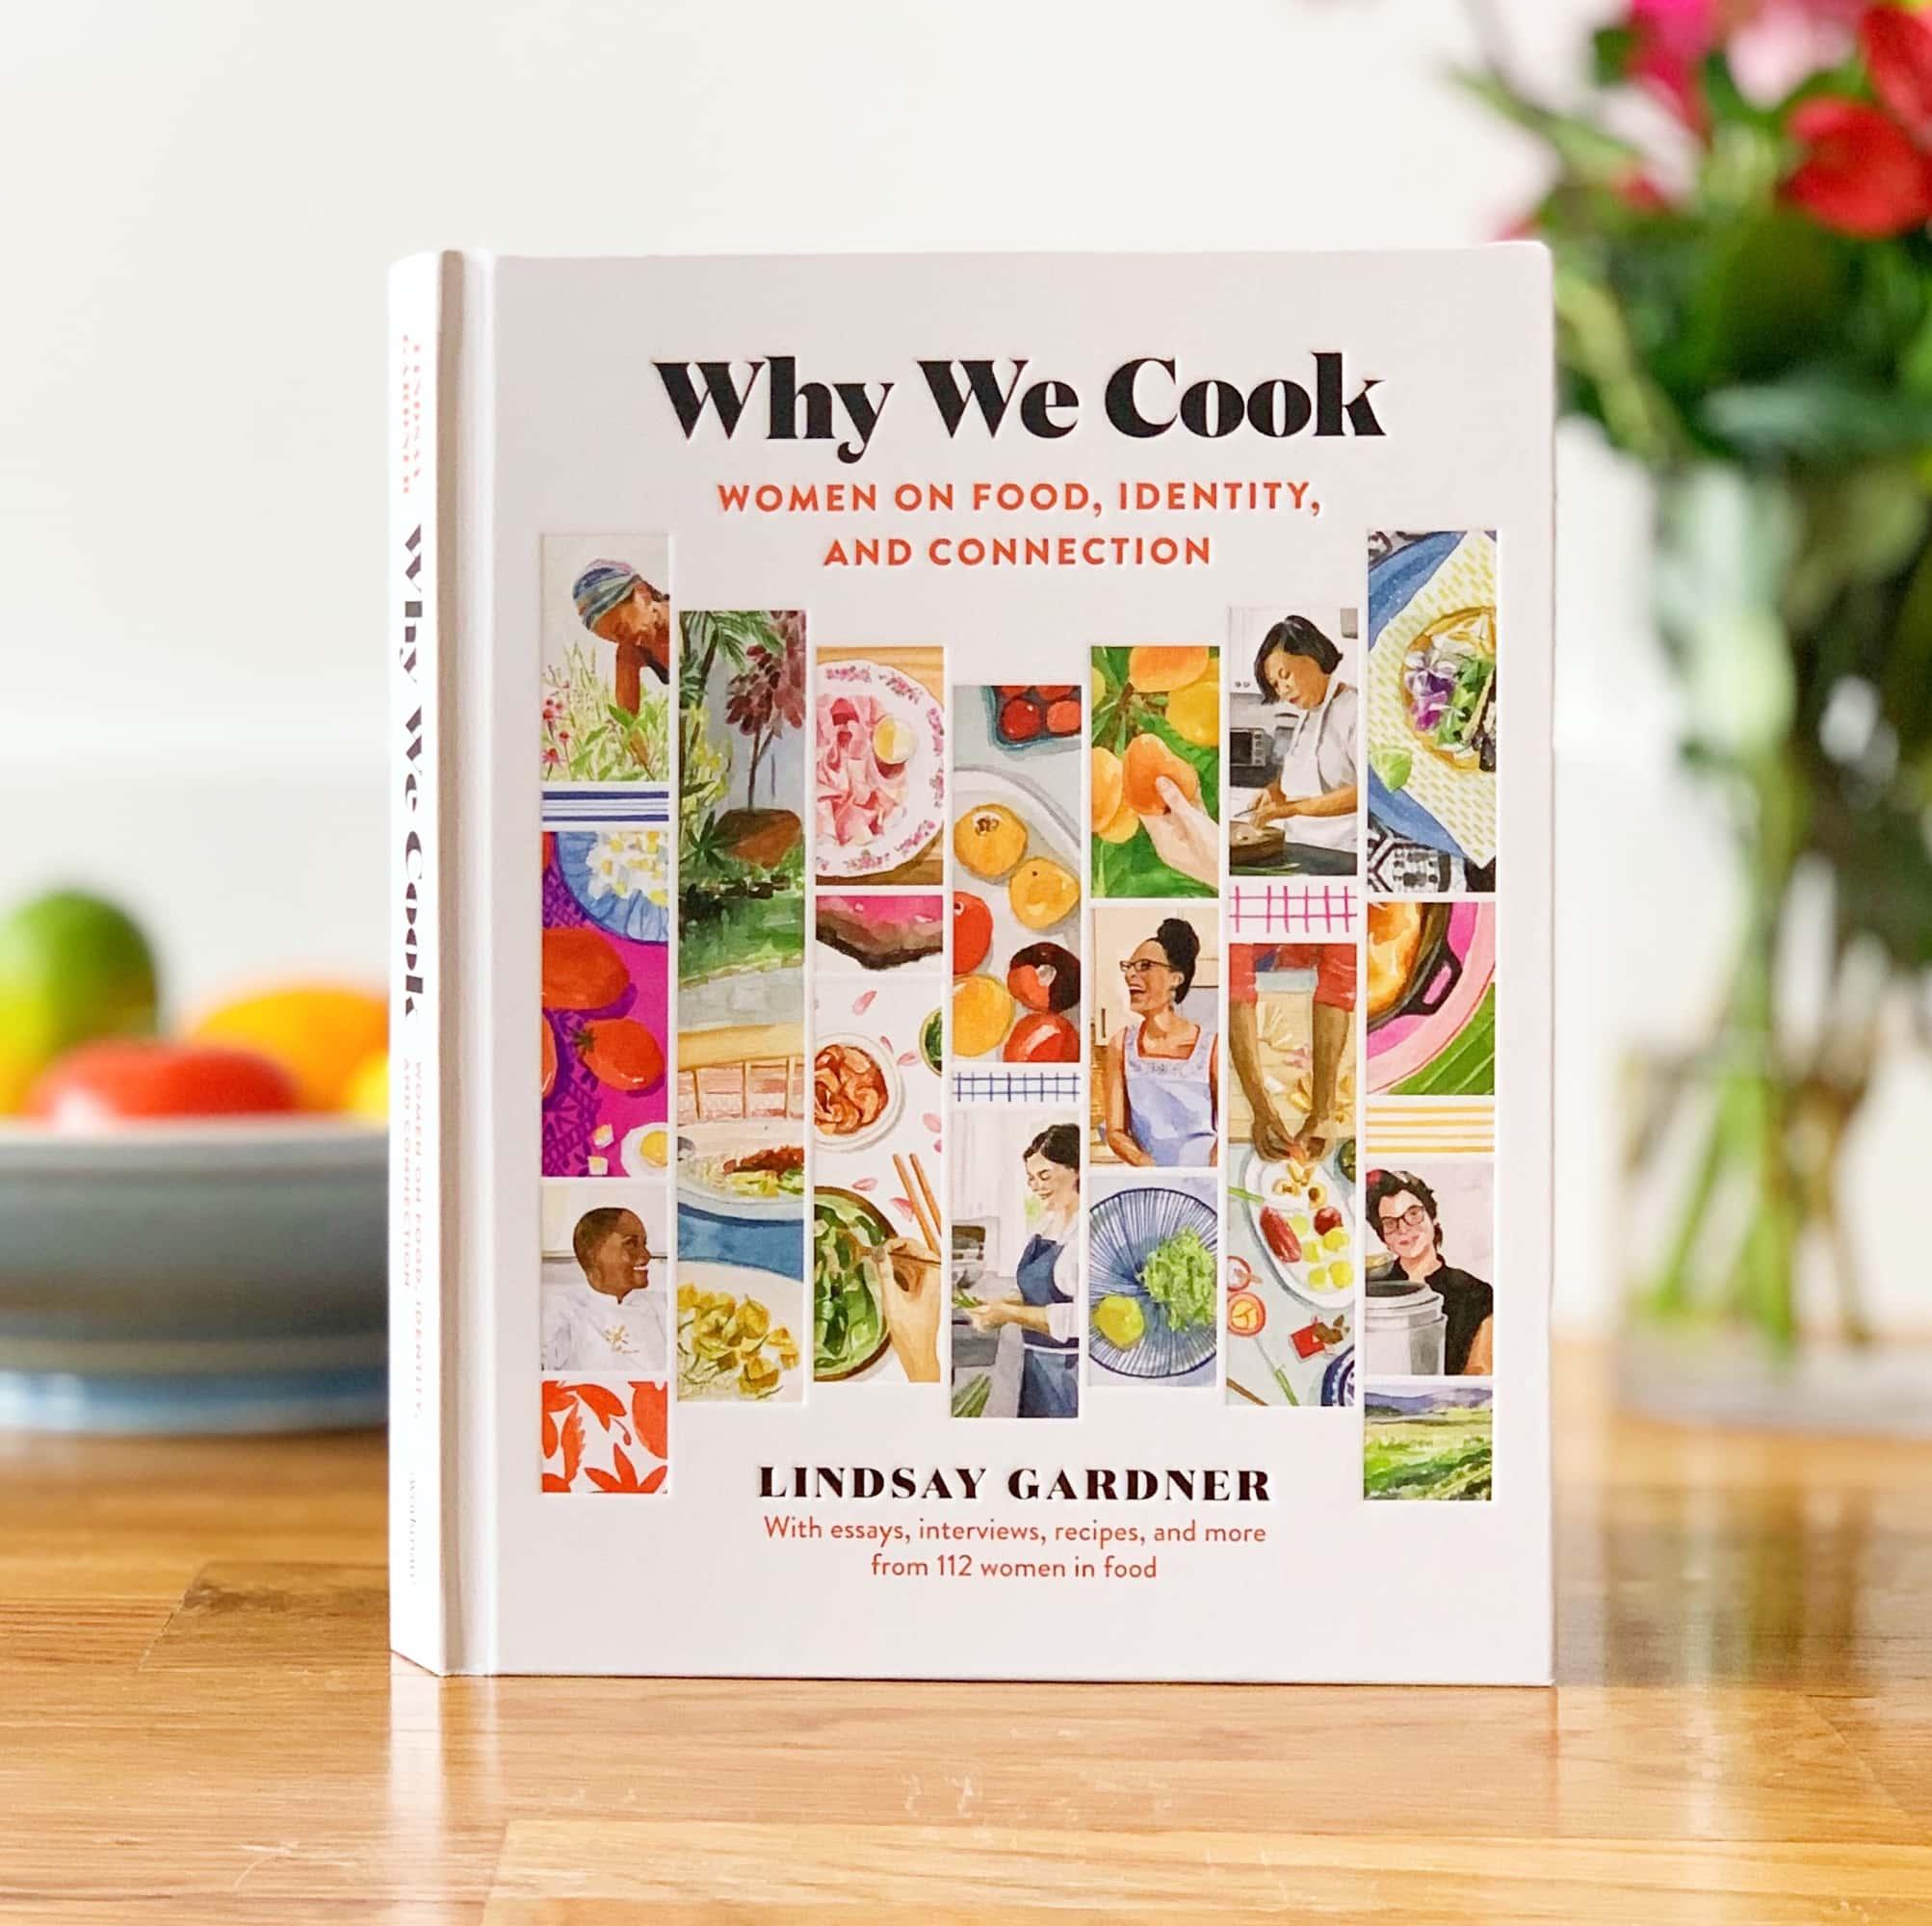 Book called why we cook by Lindsay Gardner